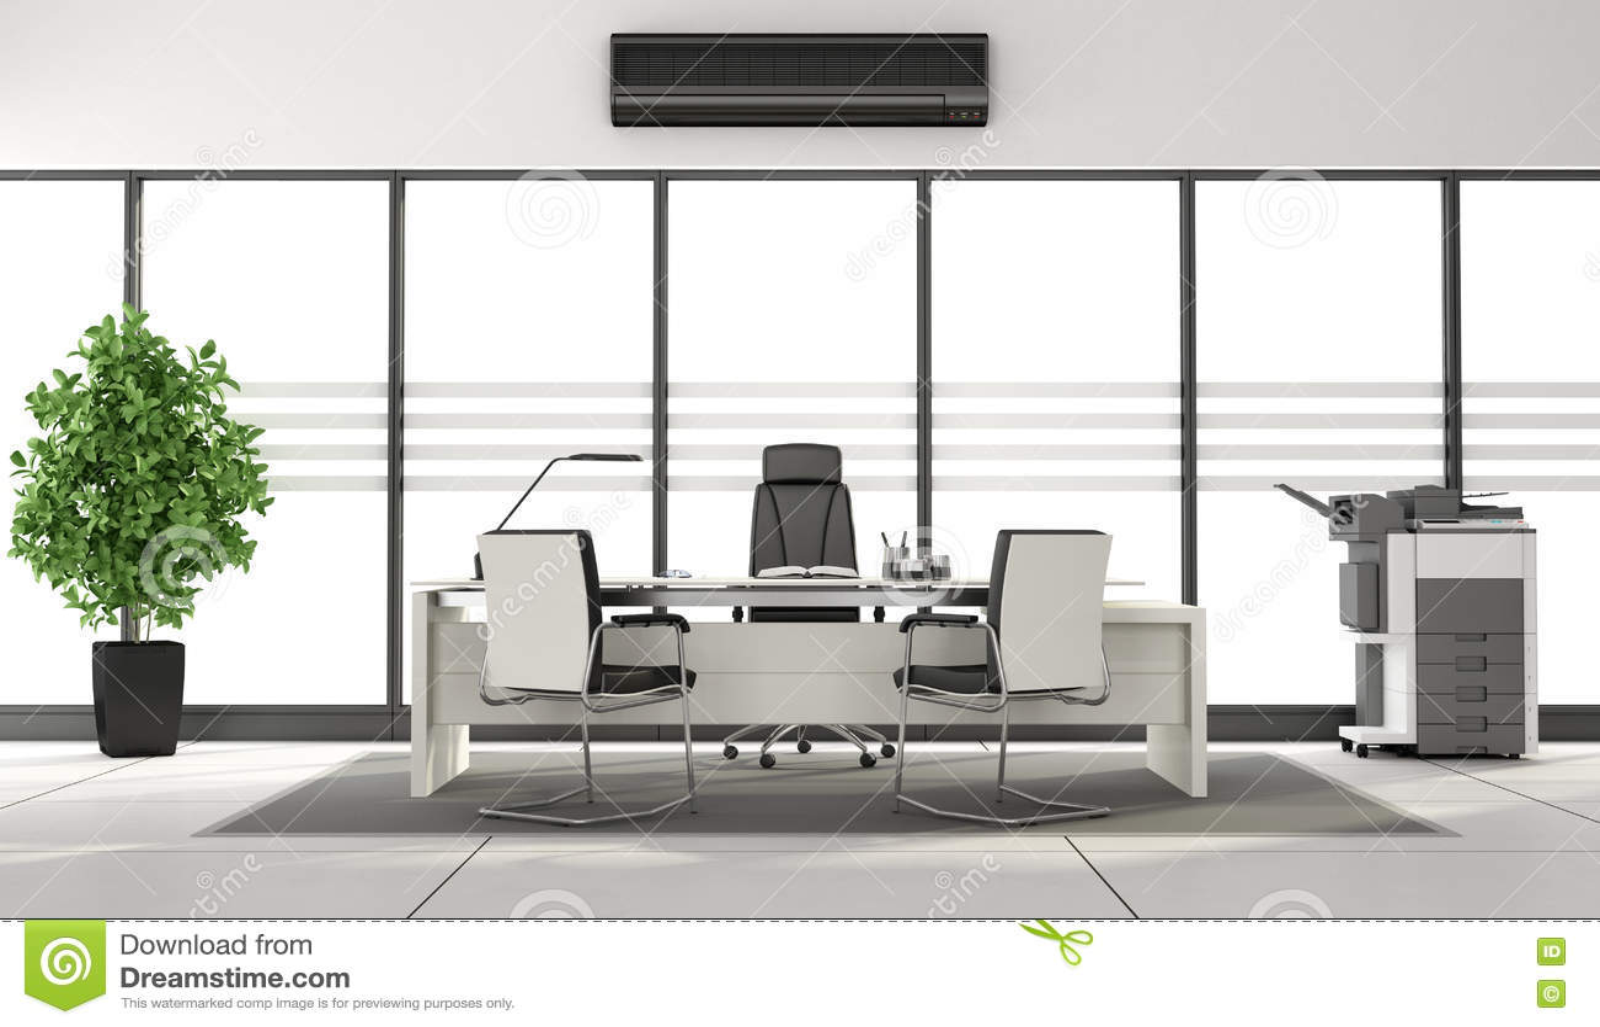 Black And White Minimalist Office Stock Illustration - Image: 74052880